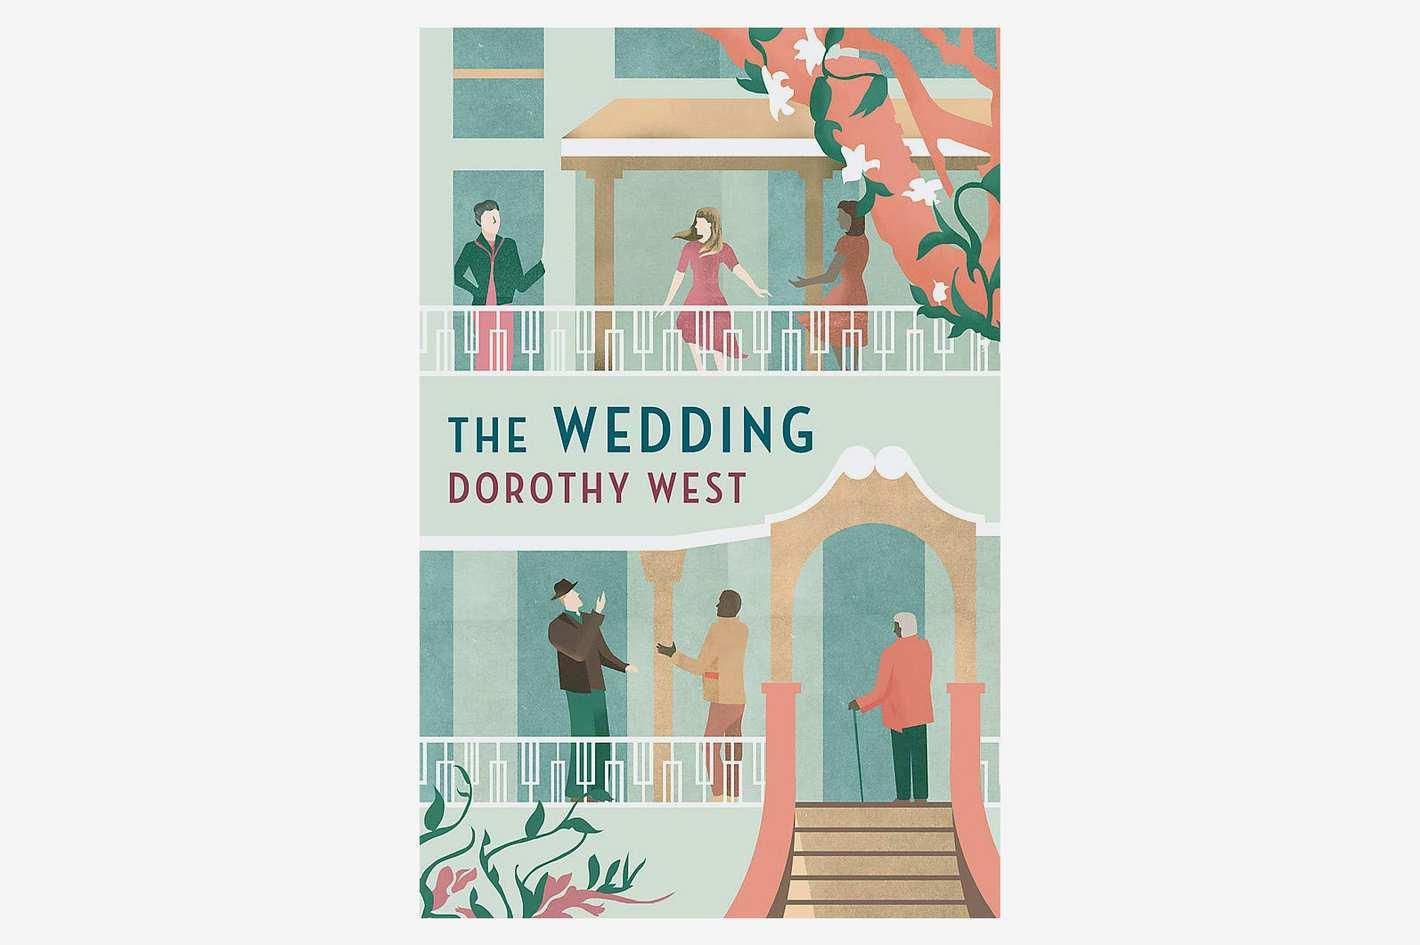 'The Wedding' by Dorothy West (Virago Modern Classics)